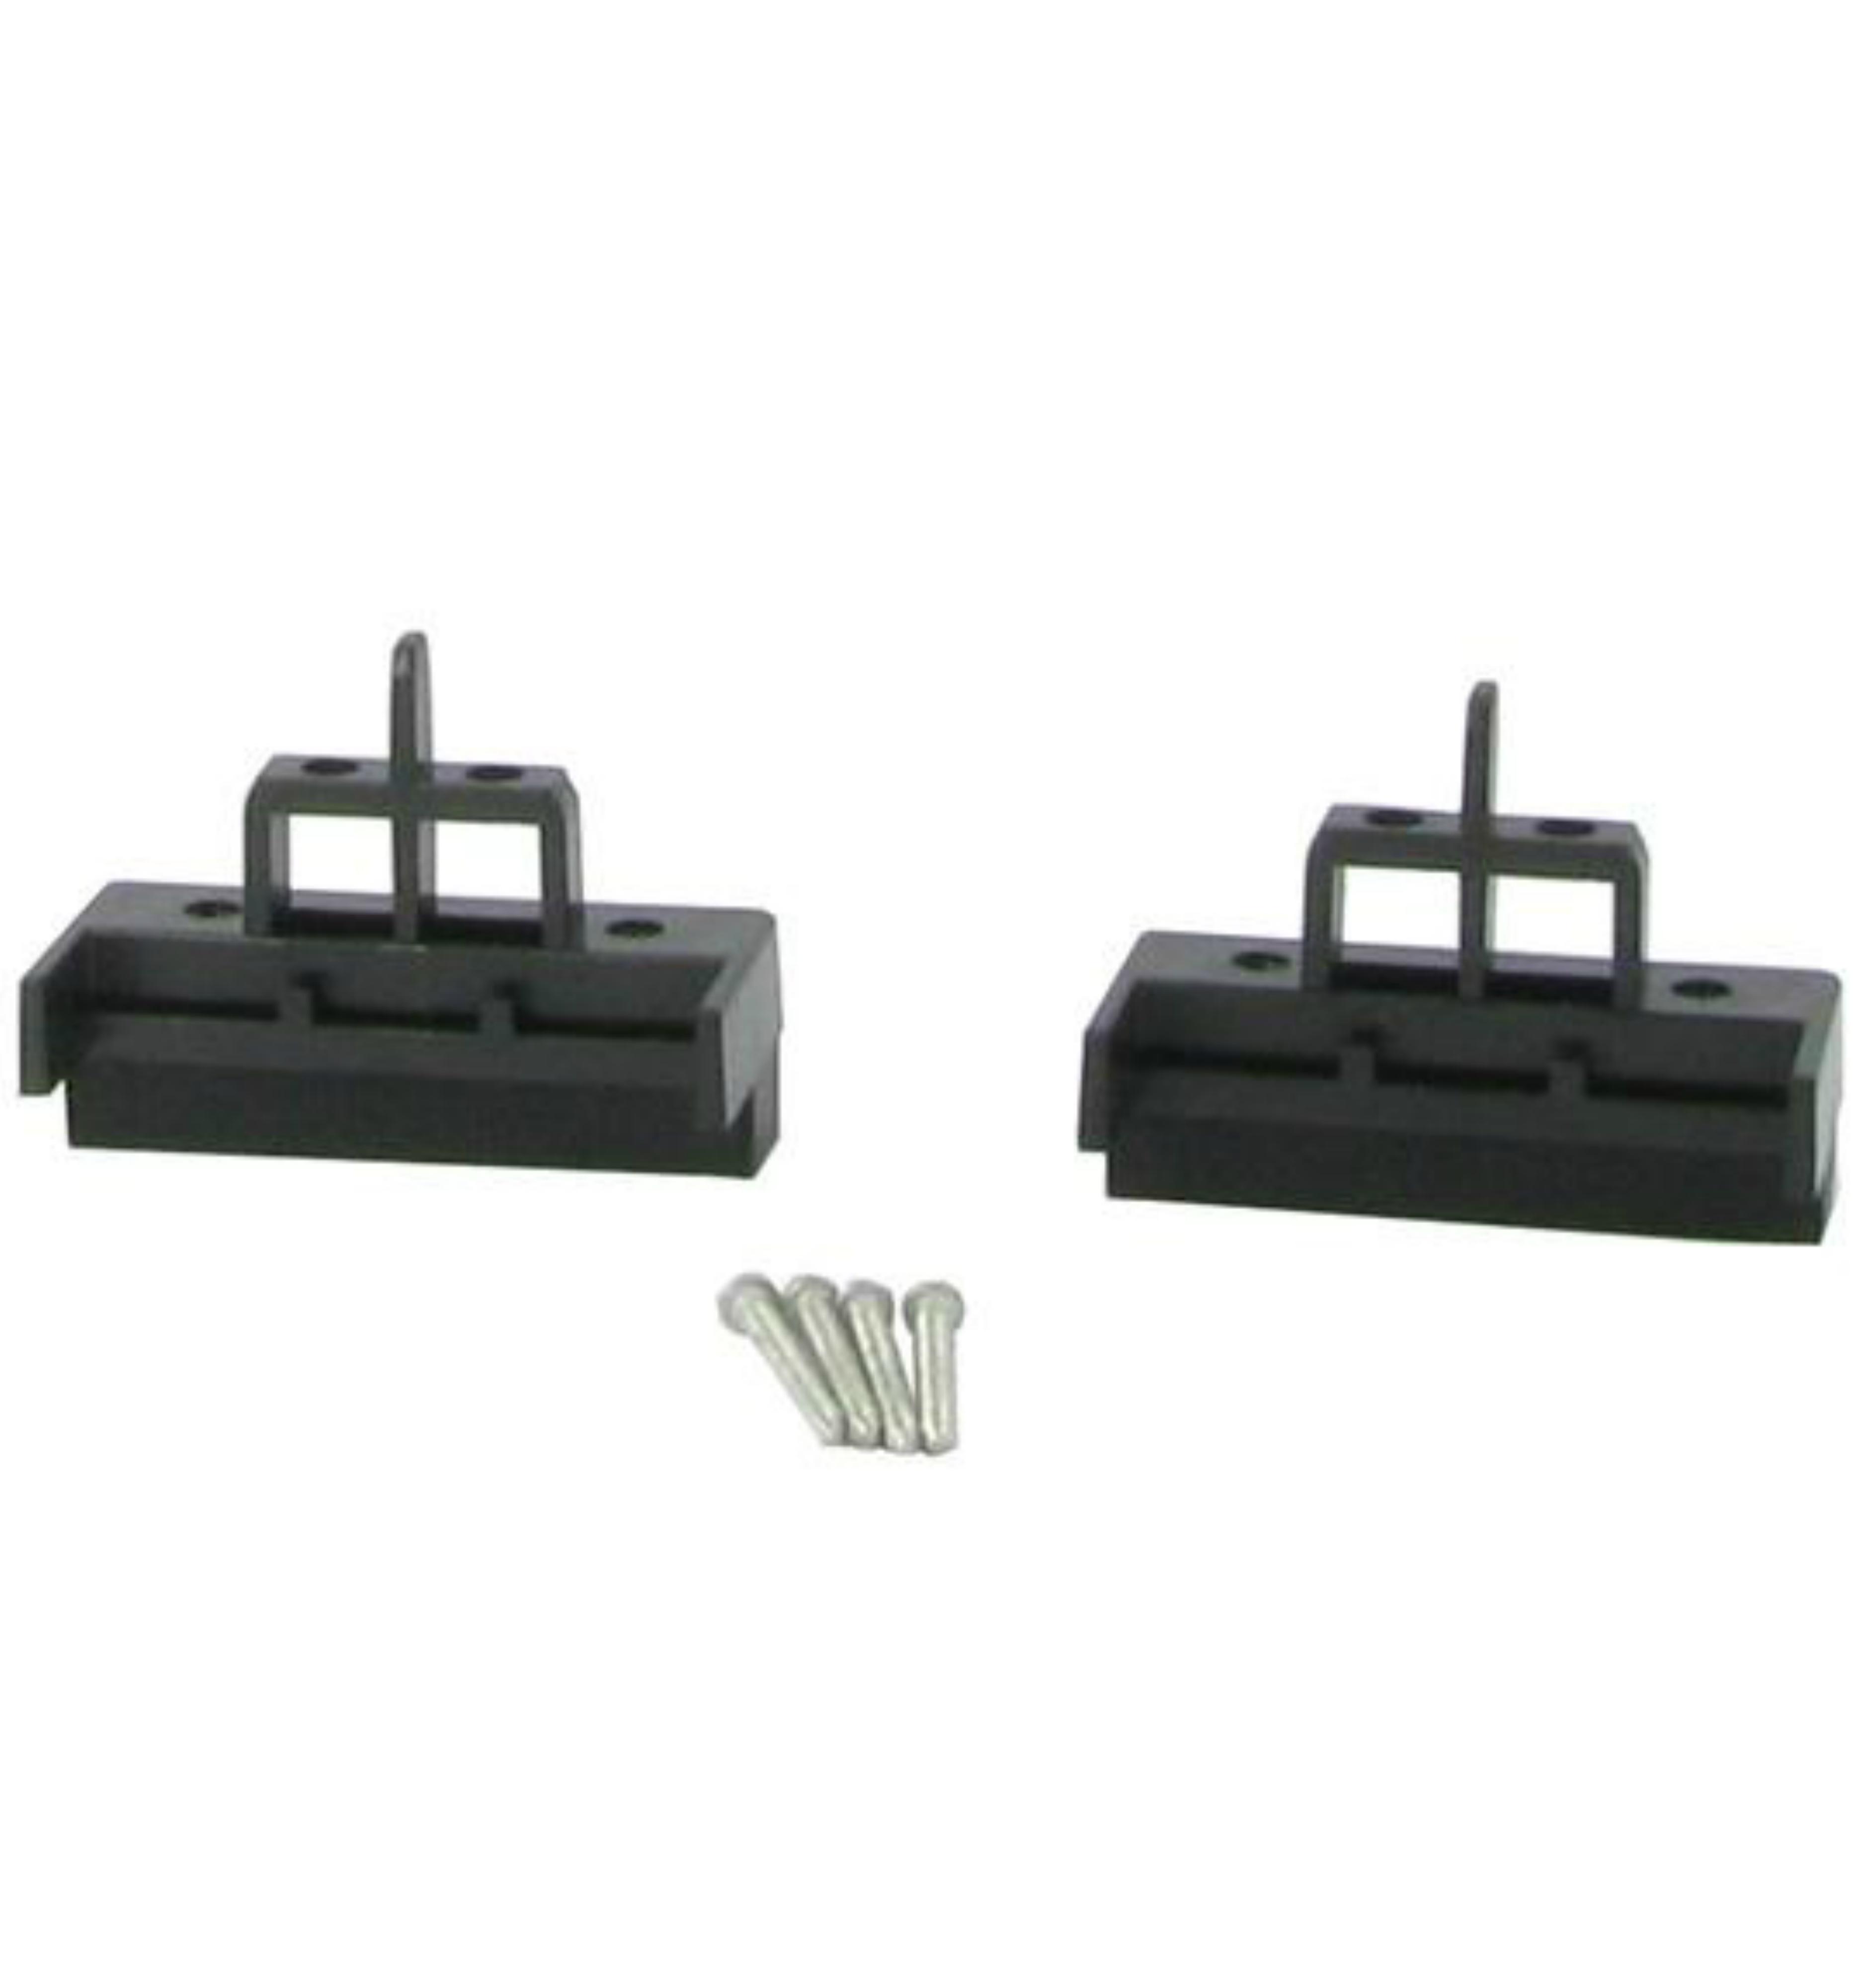 NEW C2 24AU01 Car Stereo Fascia Plate Adaptor For Audi A2/A3/A4/A6/TT